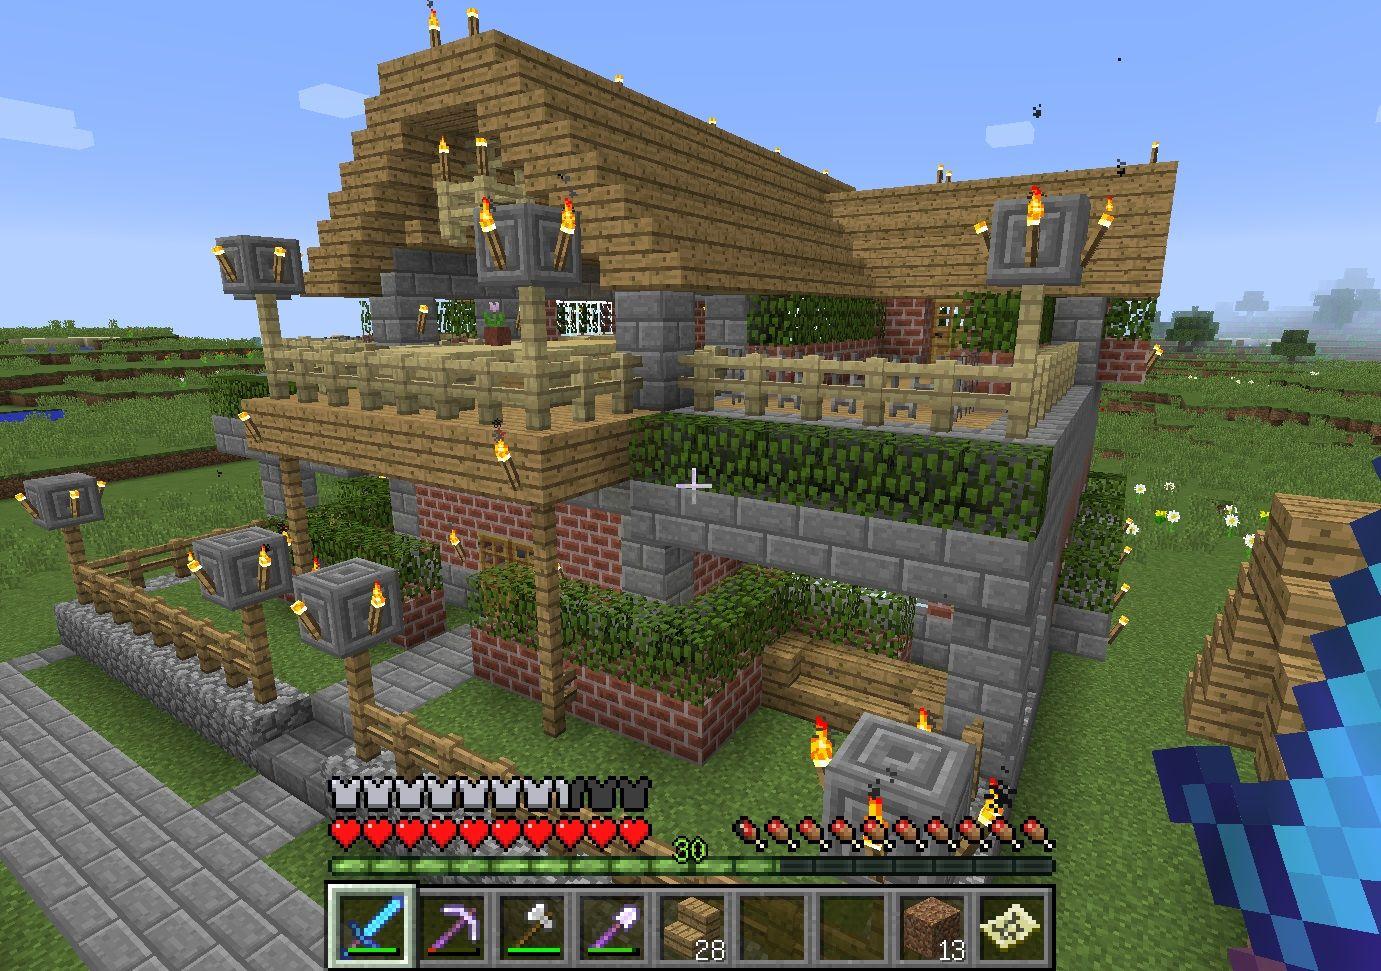 マイクラ 木造建築 の画像検索結果 木造建築 木造 建築